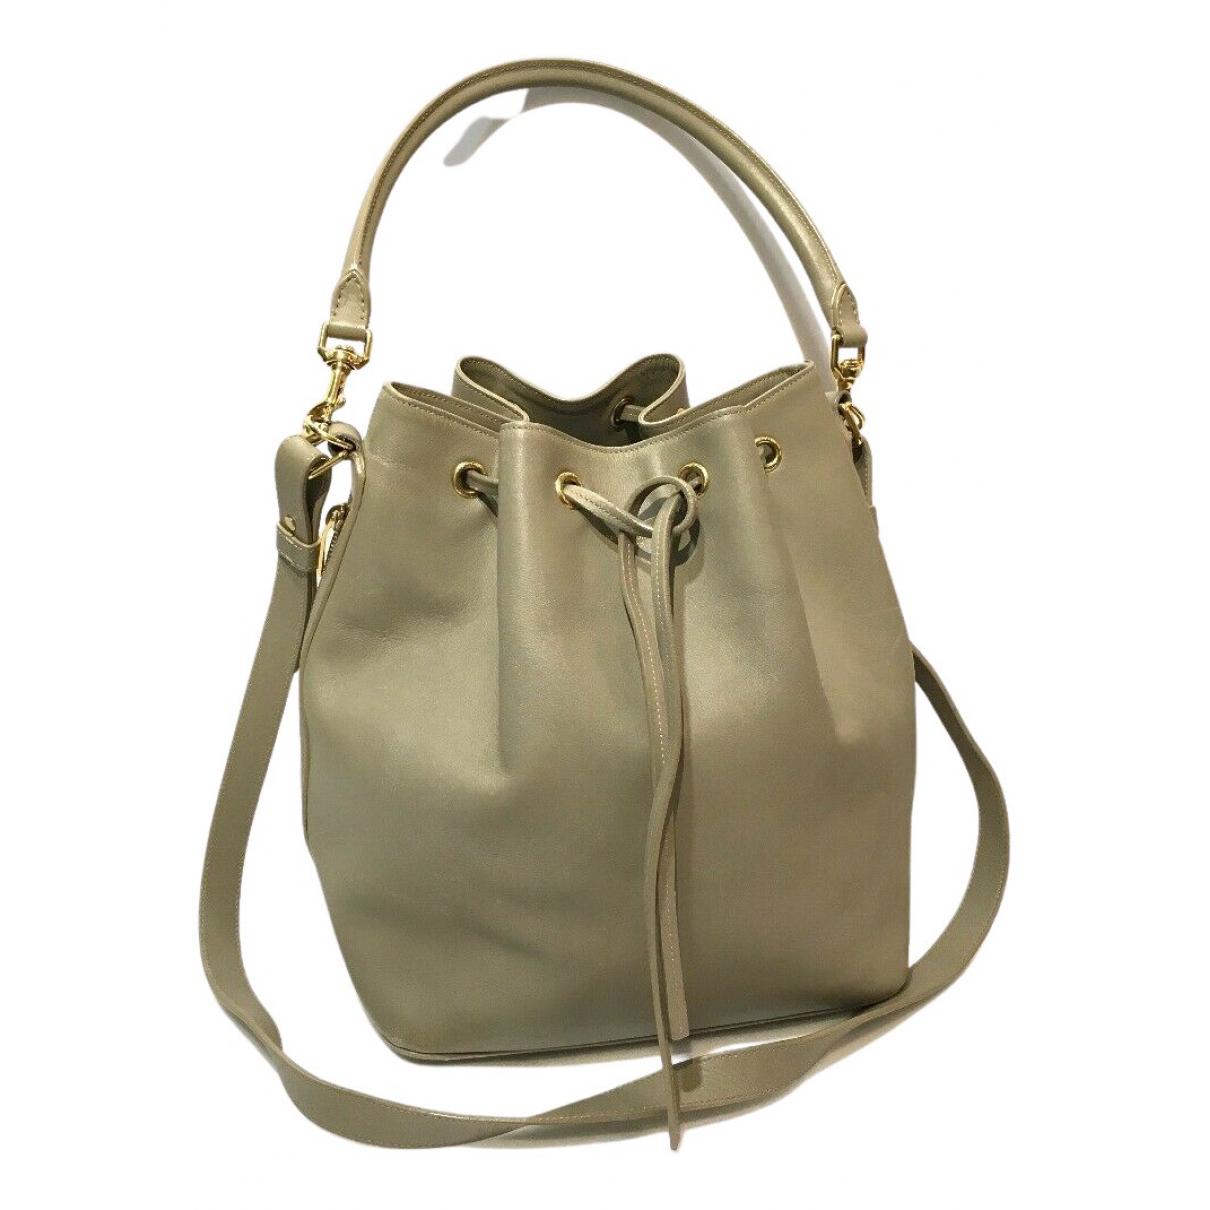 Saint Laurent Emmanuelle Beige Leather handbag for Women N